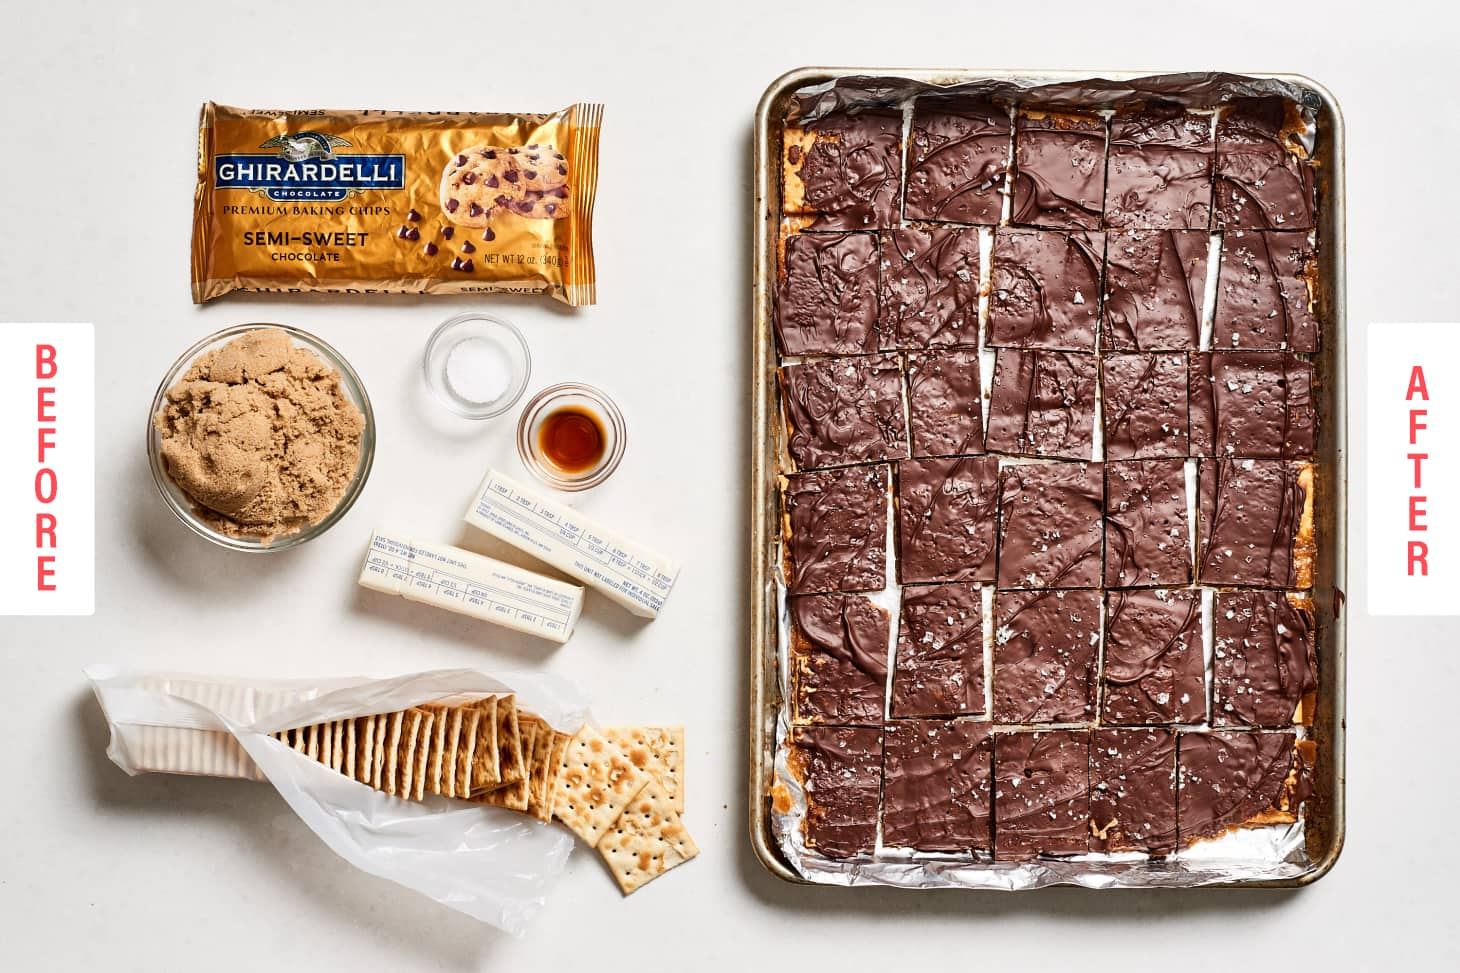 recipe for christmas crack using ritz crackers